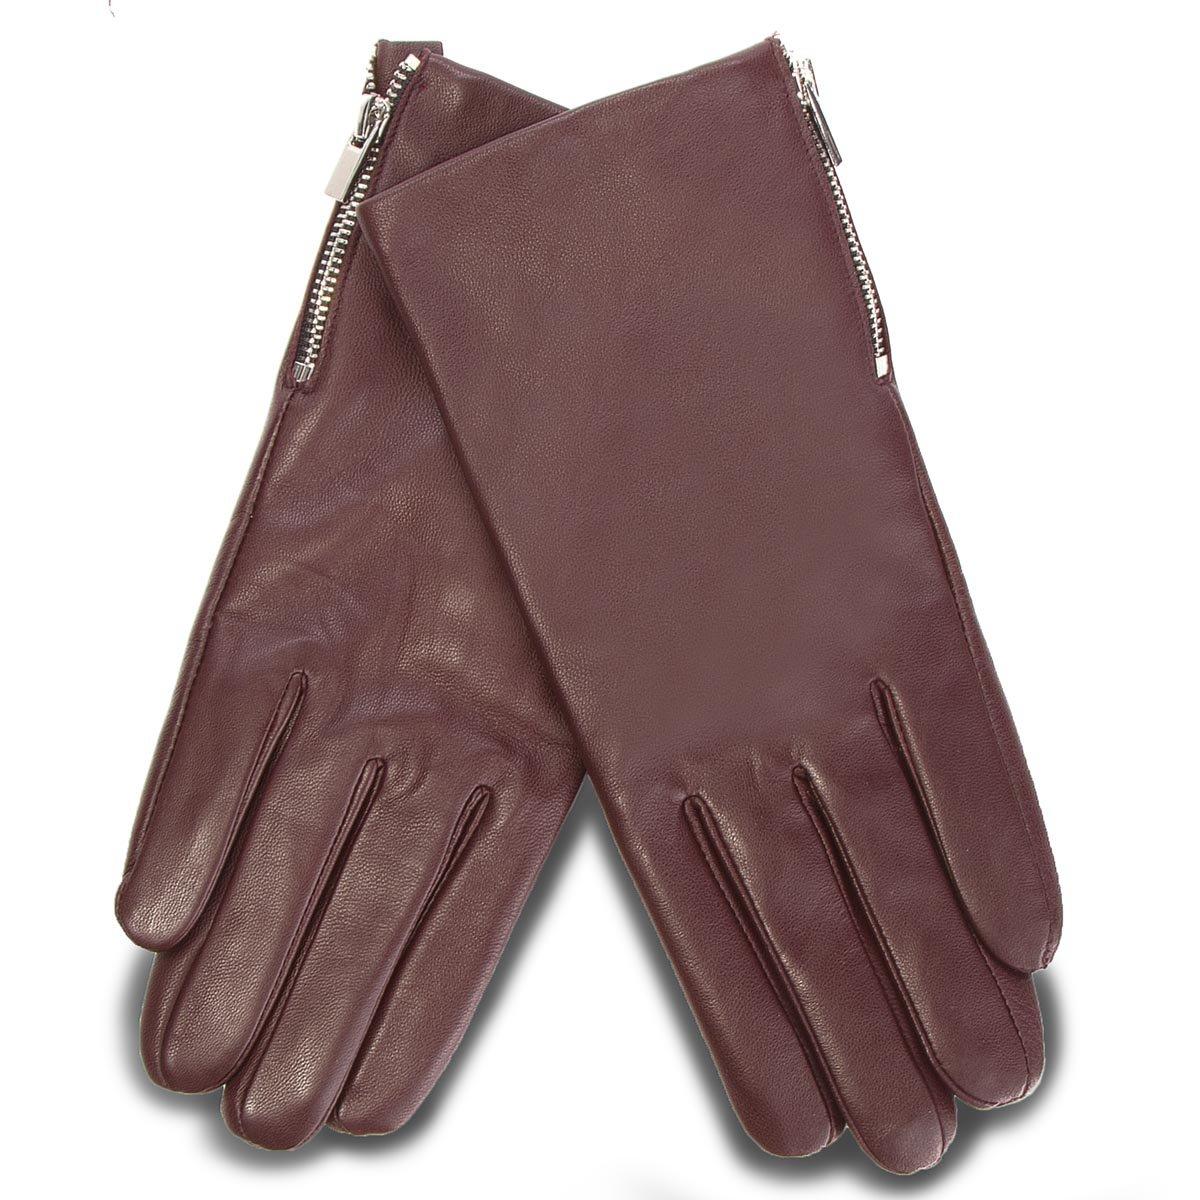 f1a143f371f Dámské rukavice Lasocki 2W6-004-AW18 bordó Dámské - Doplňky - Rukavice -  https   ccc.eu